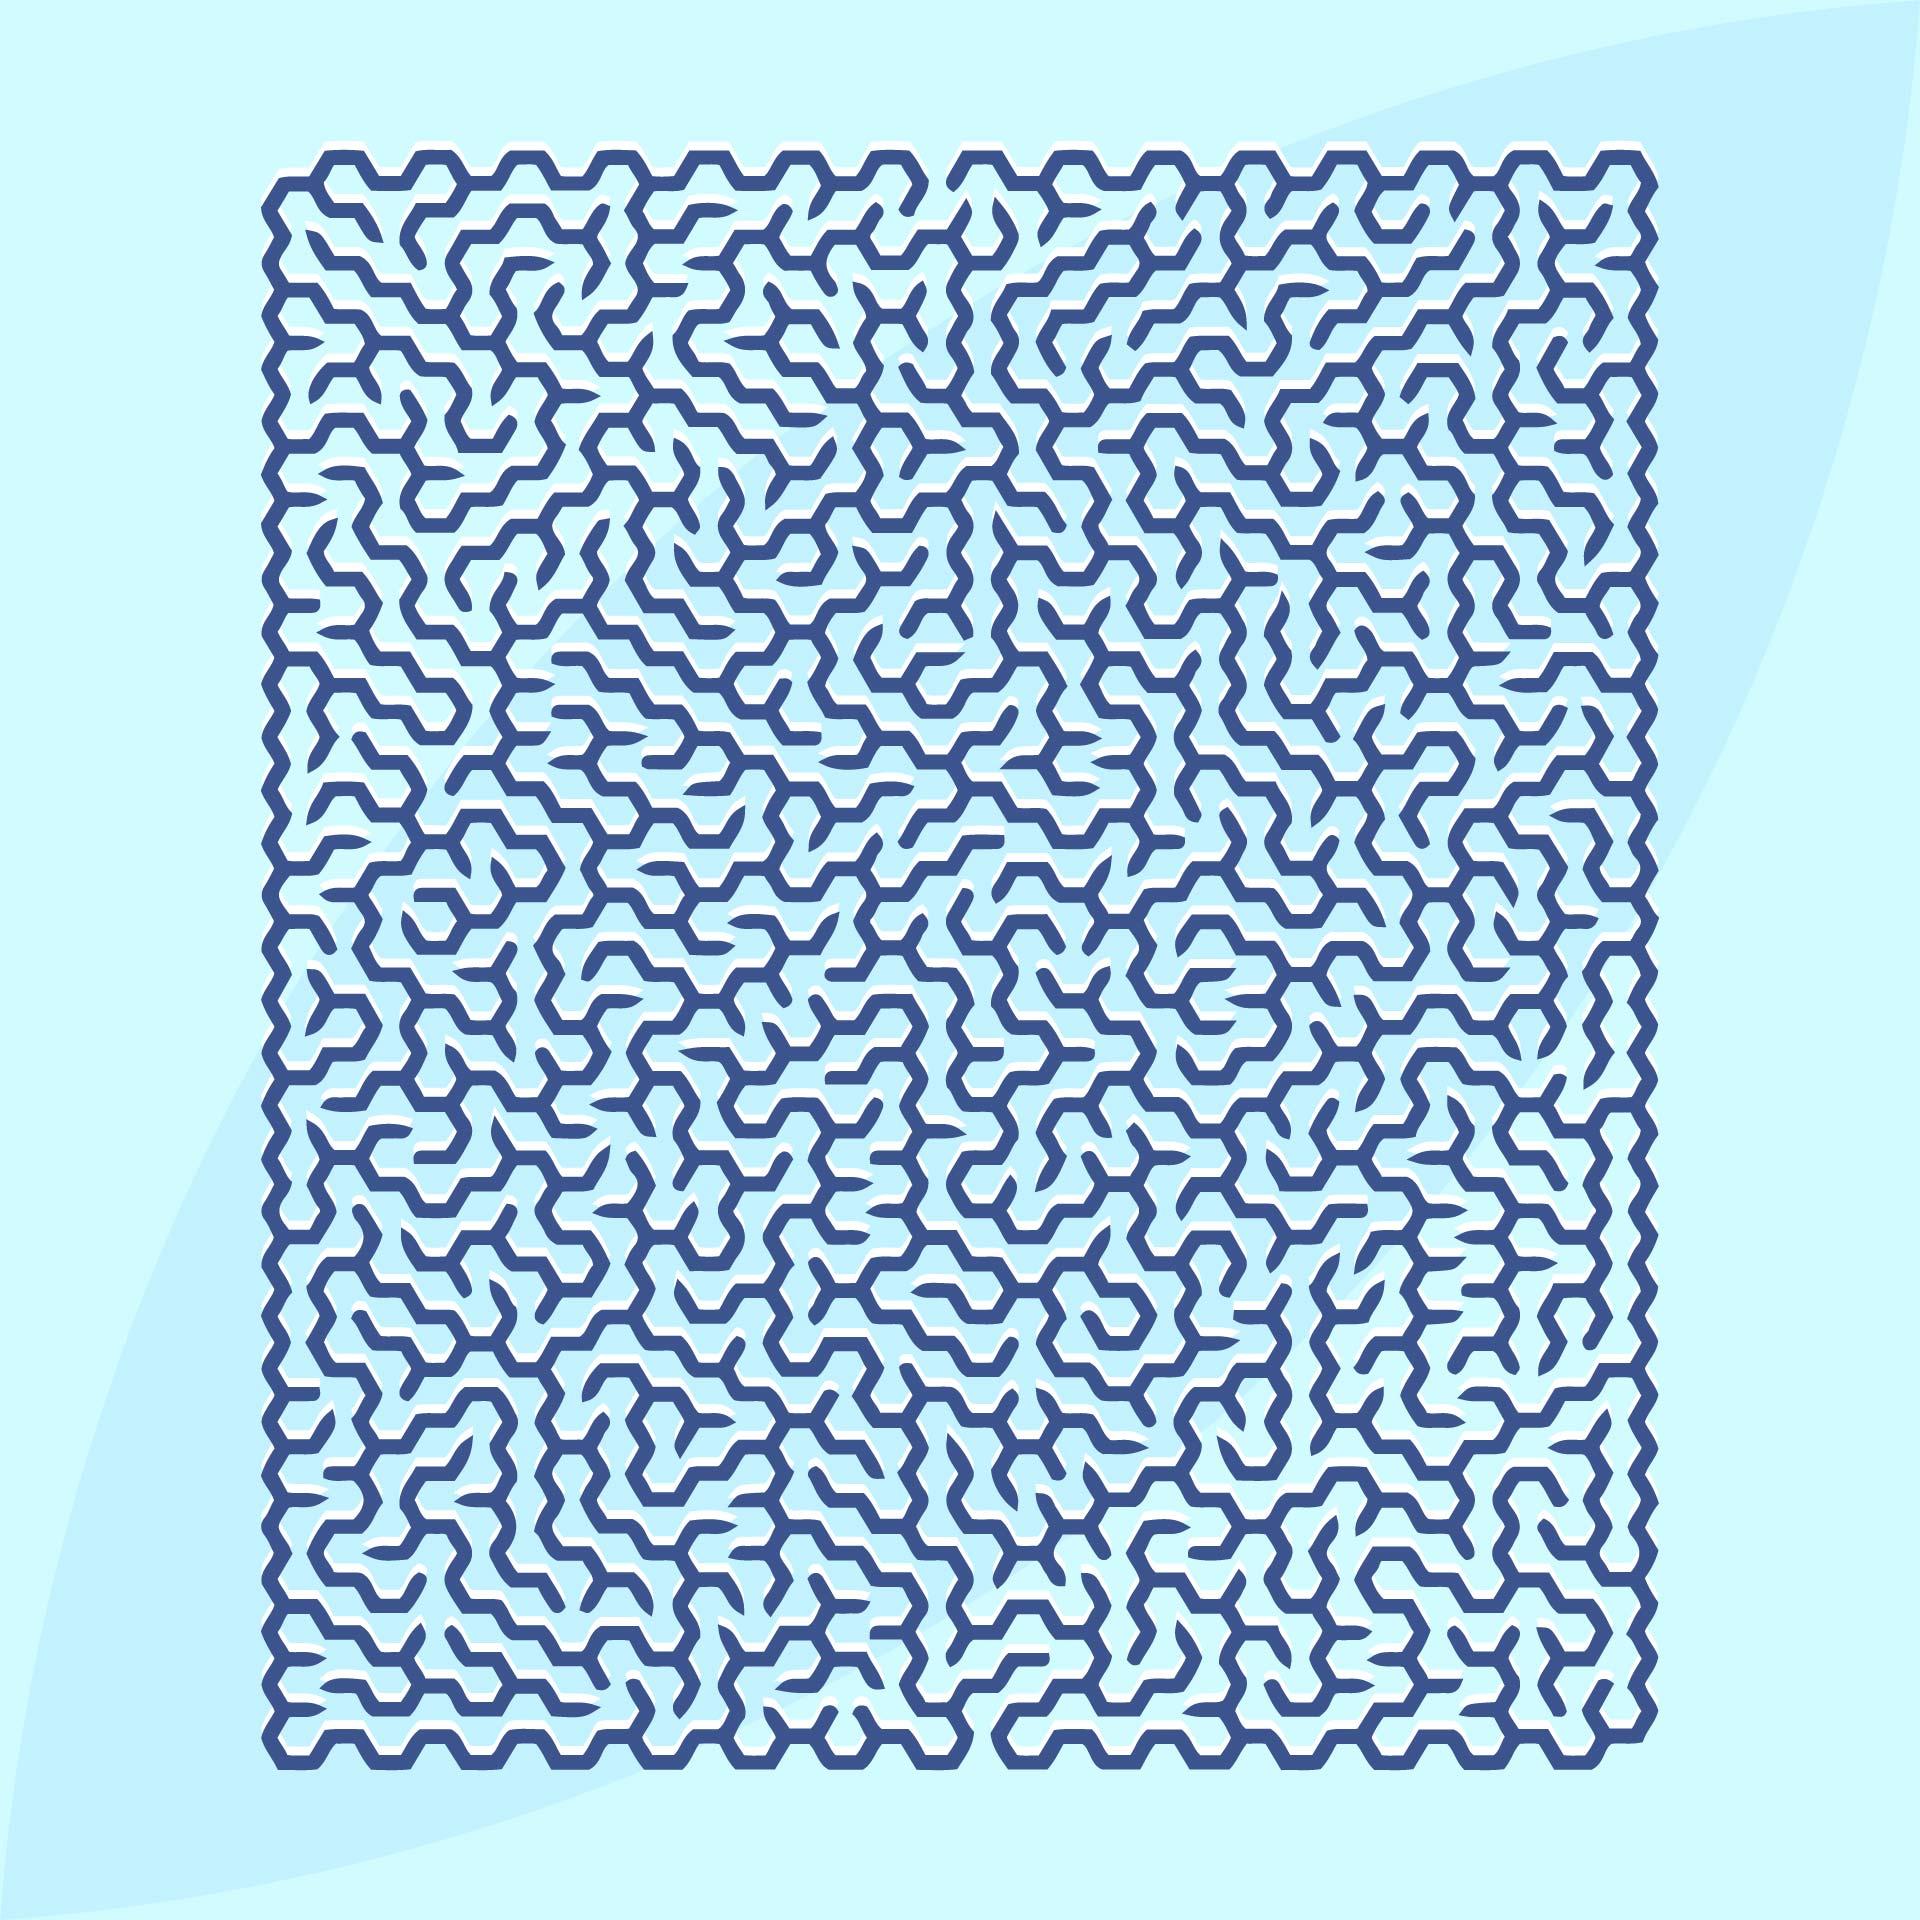 Super Hard Mazes Printable